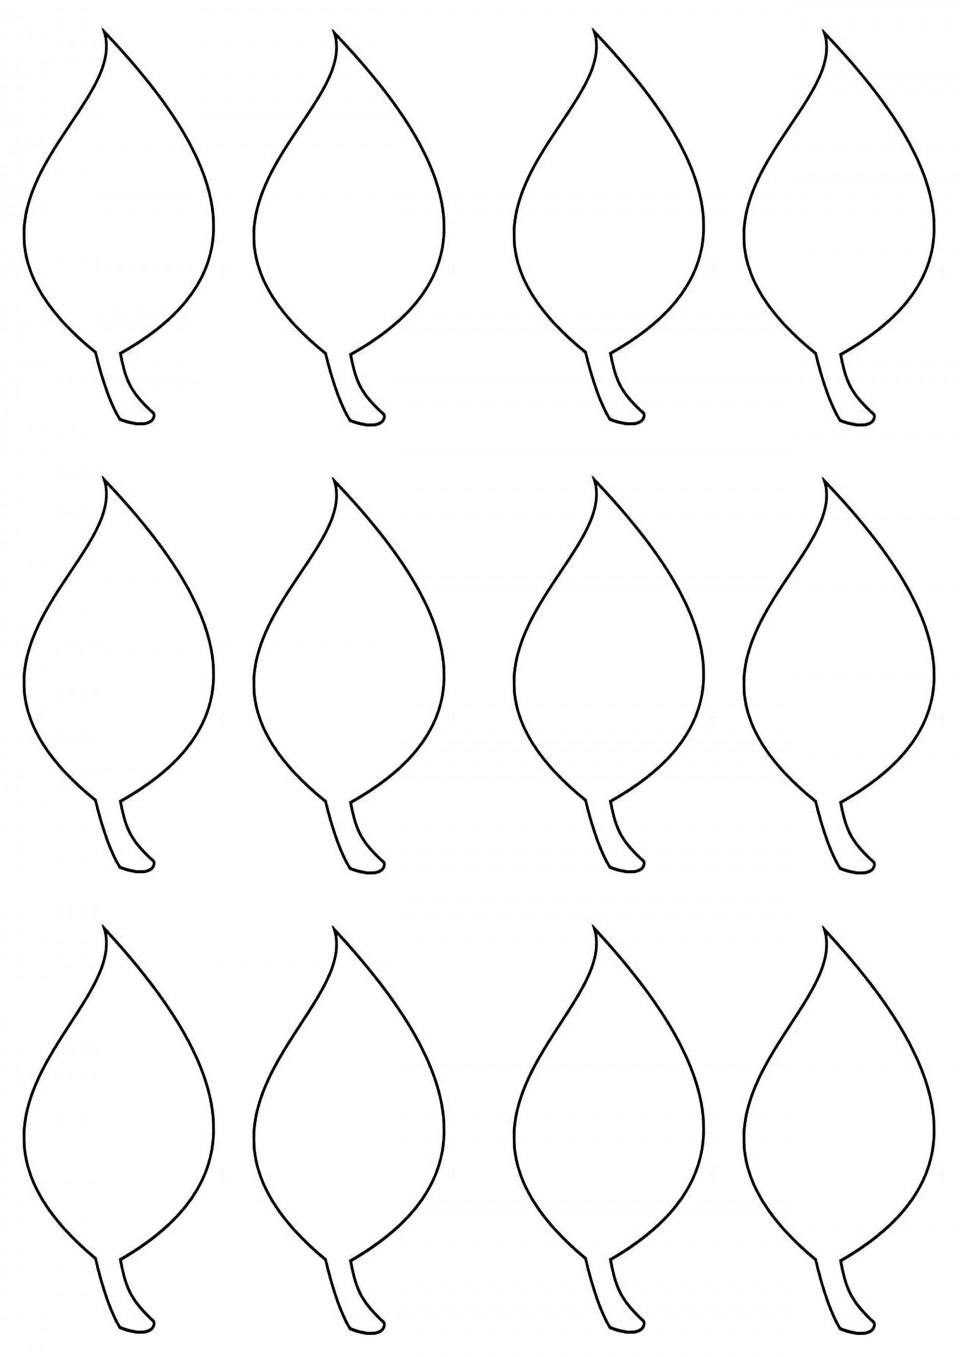 002 Impressive Blank Leaf Template With Line Image  Printable960